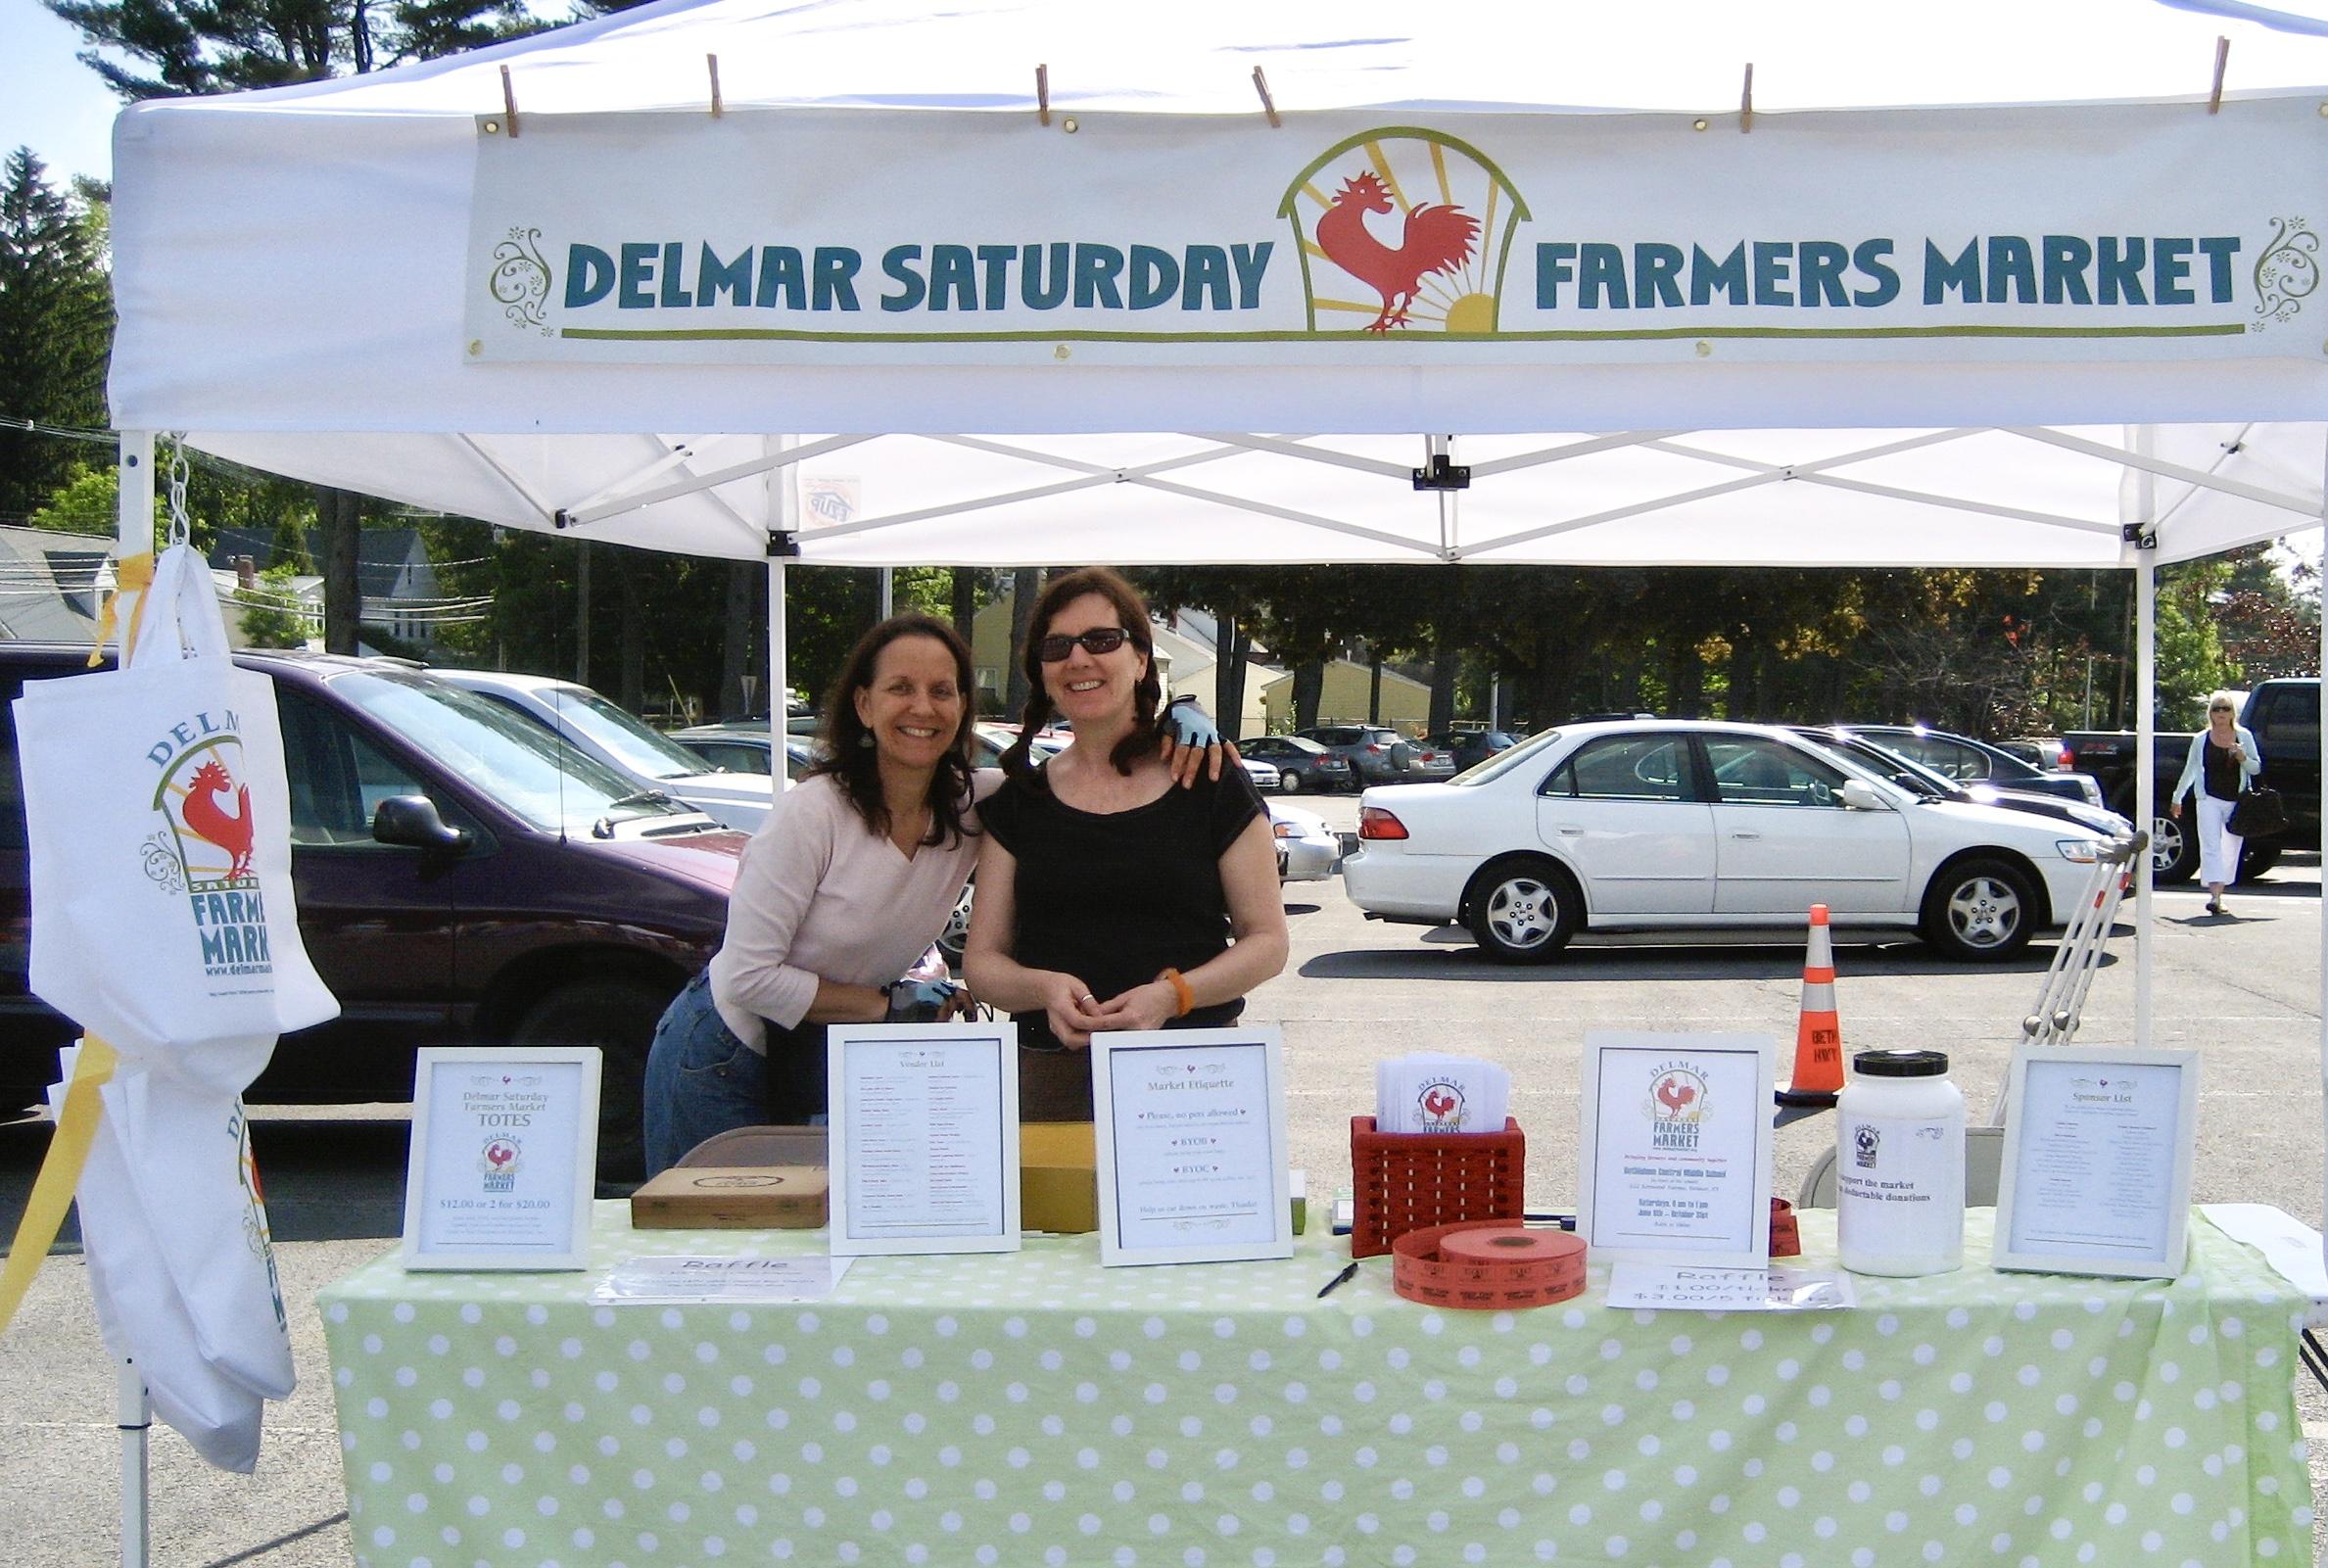 Farmer's Market Delmar, Slingerlands, Glenmont, Guilderland, Albany Voorheesville